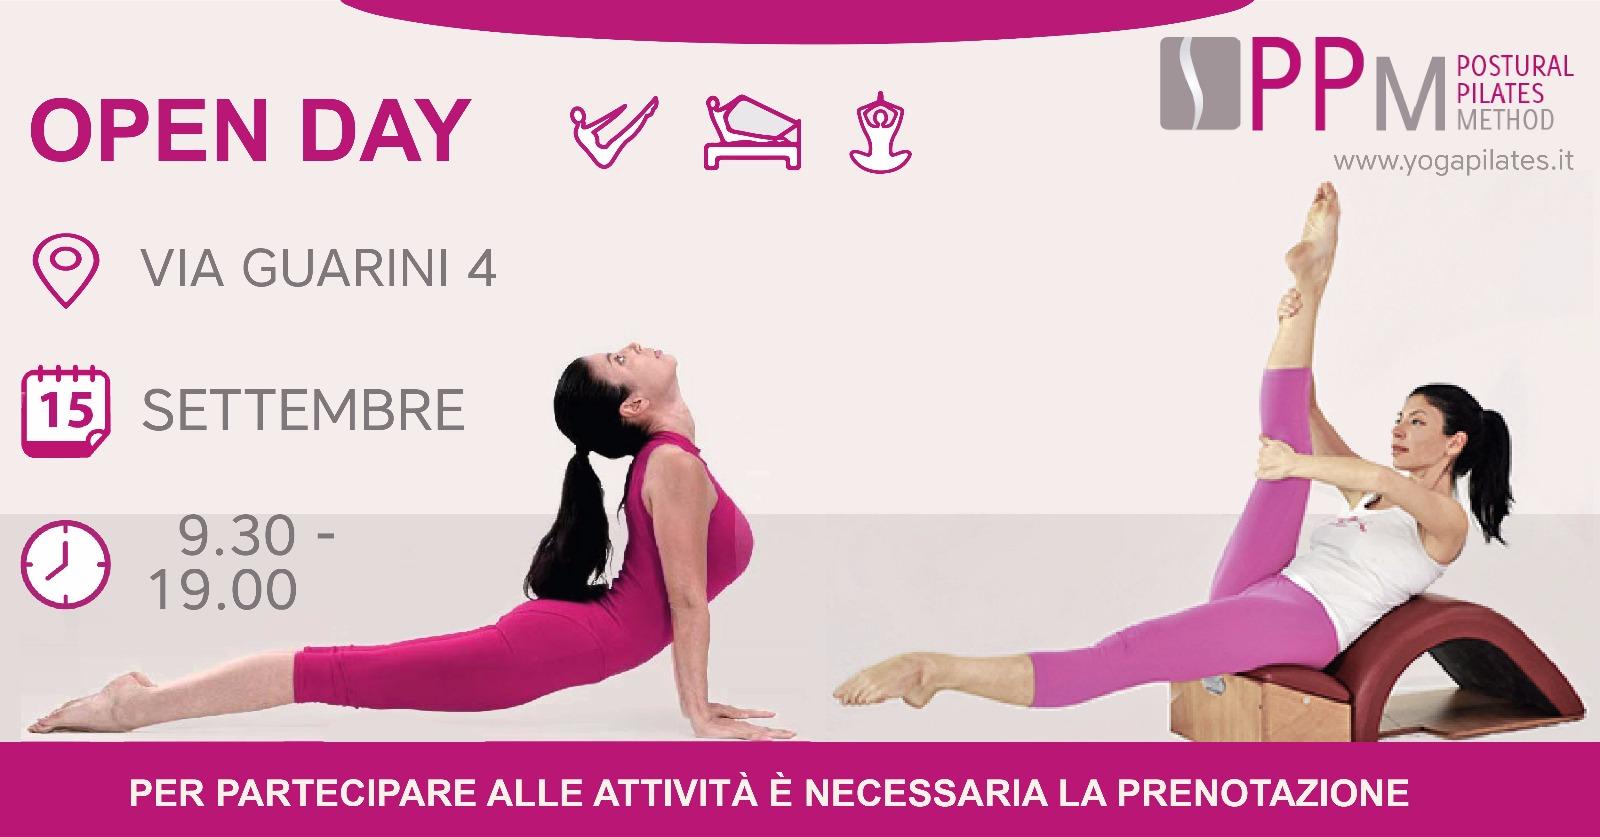 Yoga Pilates Ppm Torino Le 4 Sedi Lagrange Tassoni Santa Rita Crocetta Yogapilates